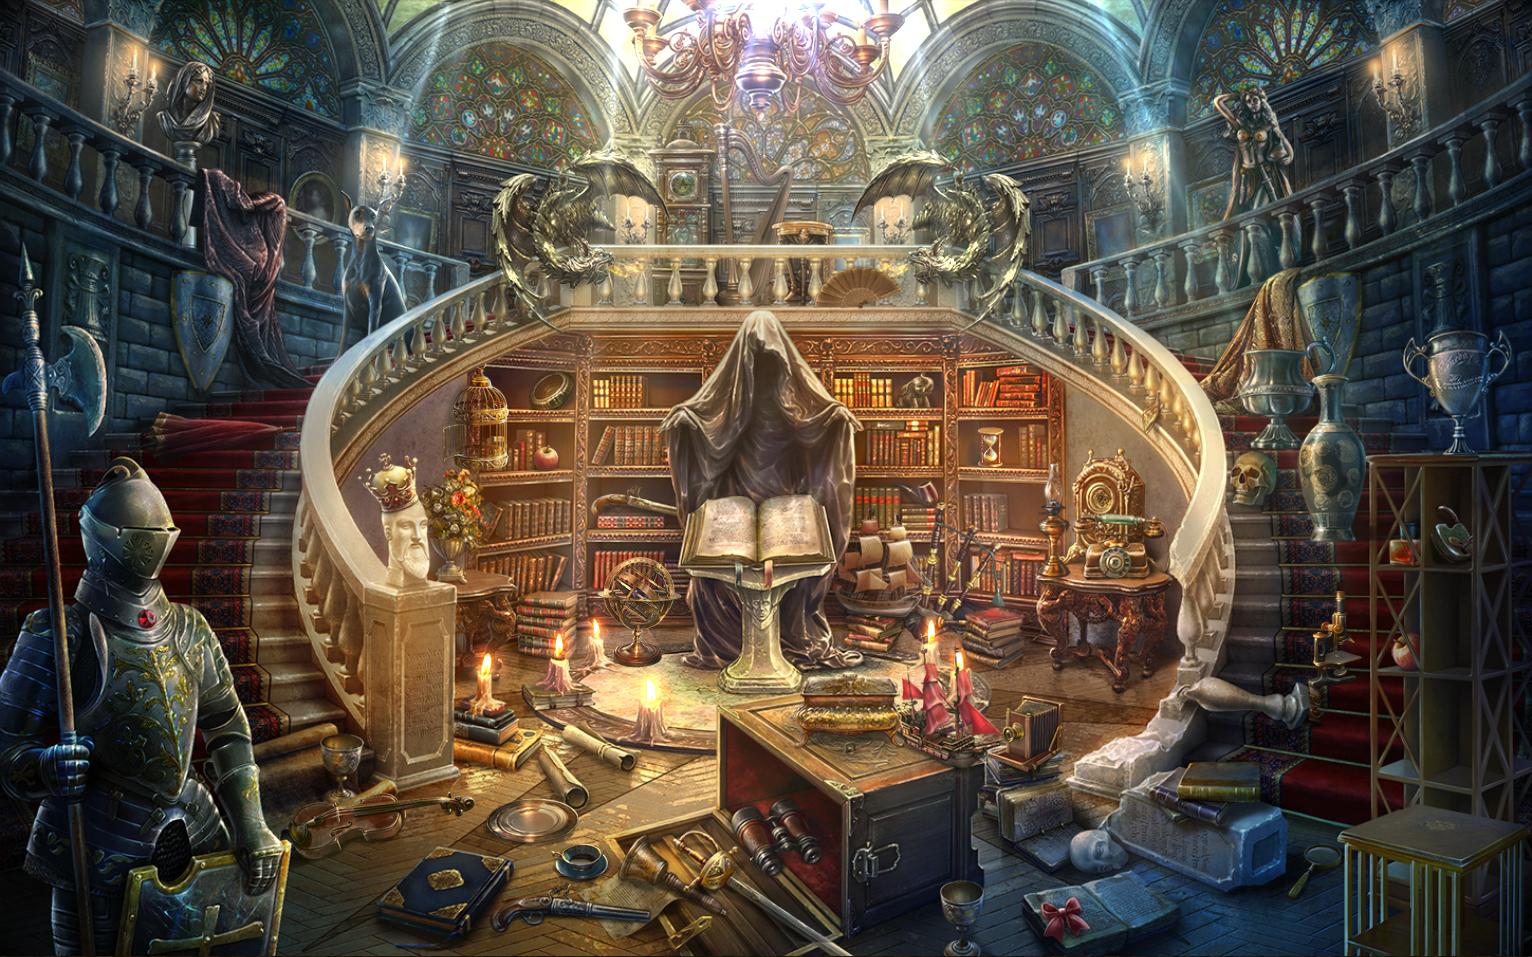 City Hall | Hidden City: Mystery of Shadows Wiki | FANDOM powered by ...